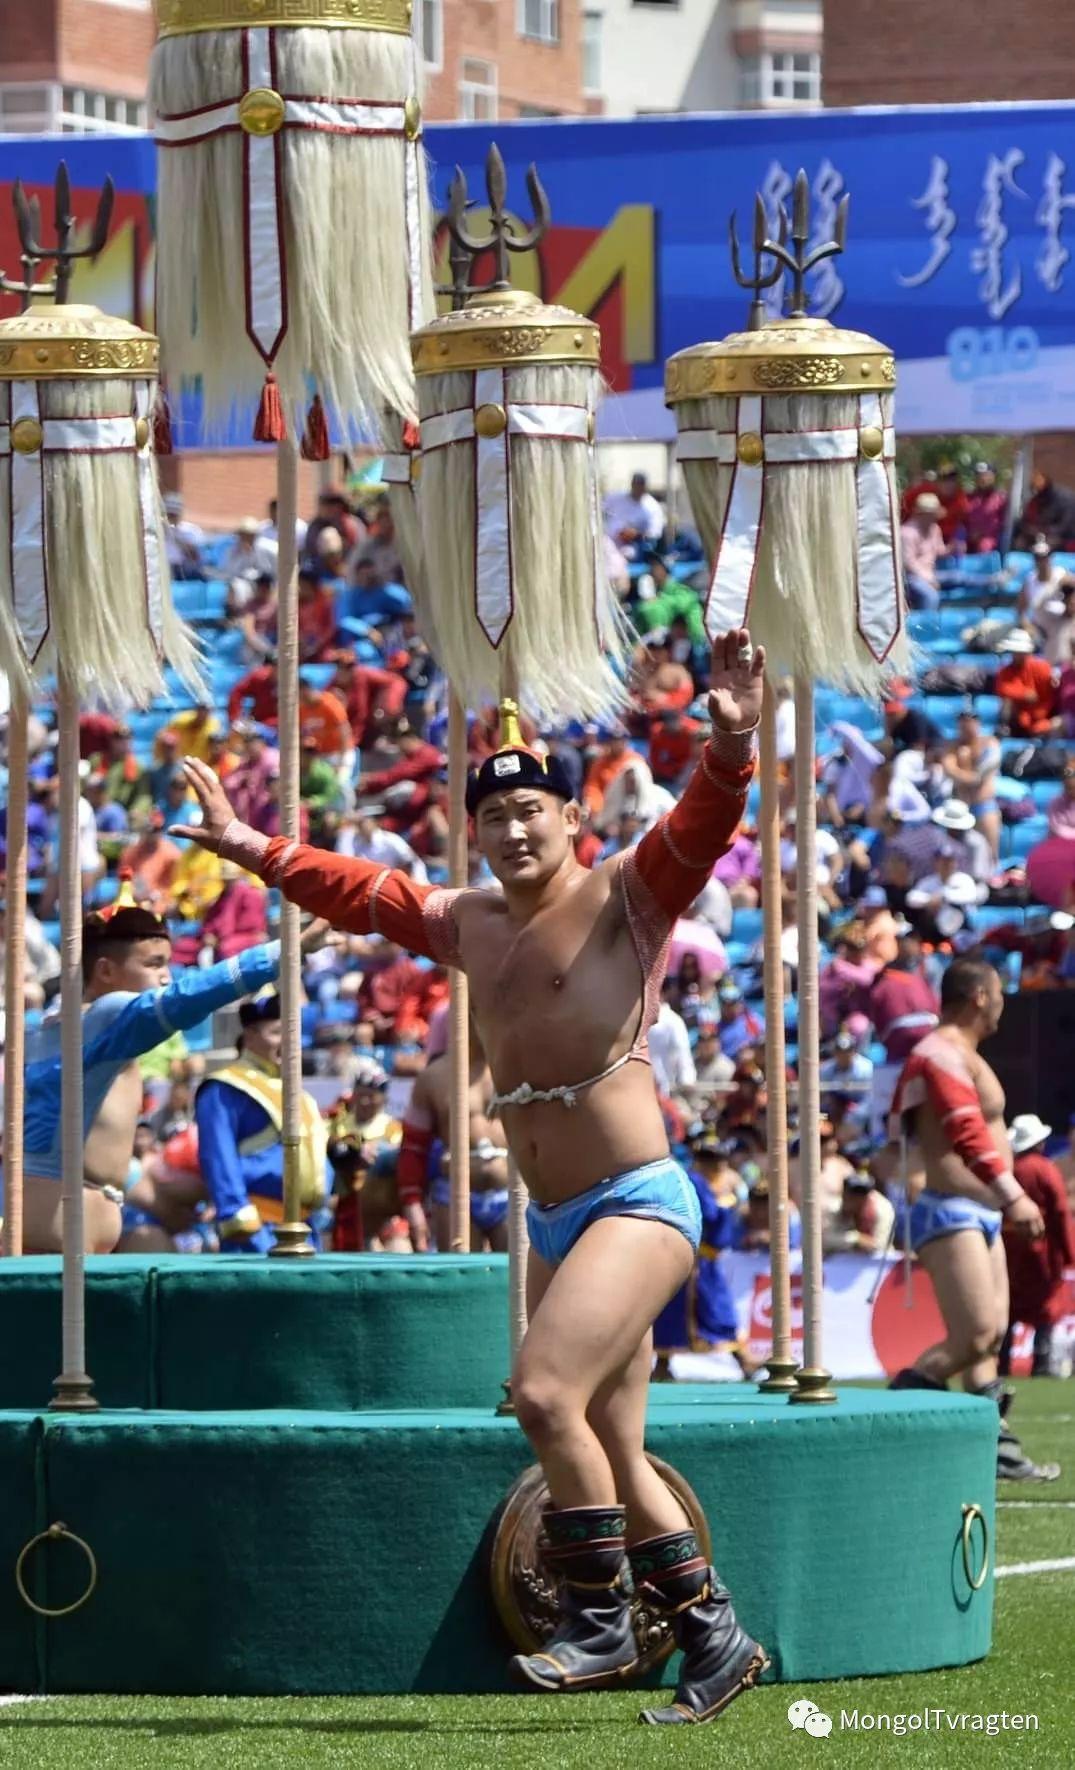 ᠮᠣᠩᠭᠣᠯ ᠨᠠᠭᠠᠳᠣᠮ 那达慕 第5张 ᠮᠣᠩᠭᠣᠯ ᠨᠠᠭᠠᠳᠣᠮ 那达慕 蒙古文化